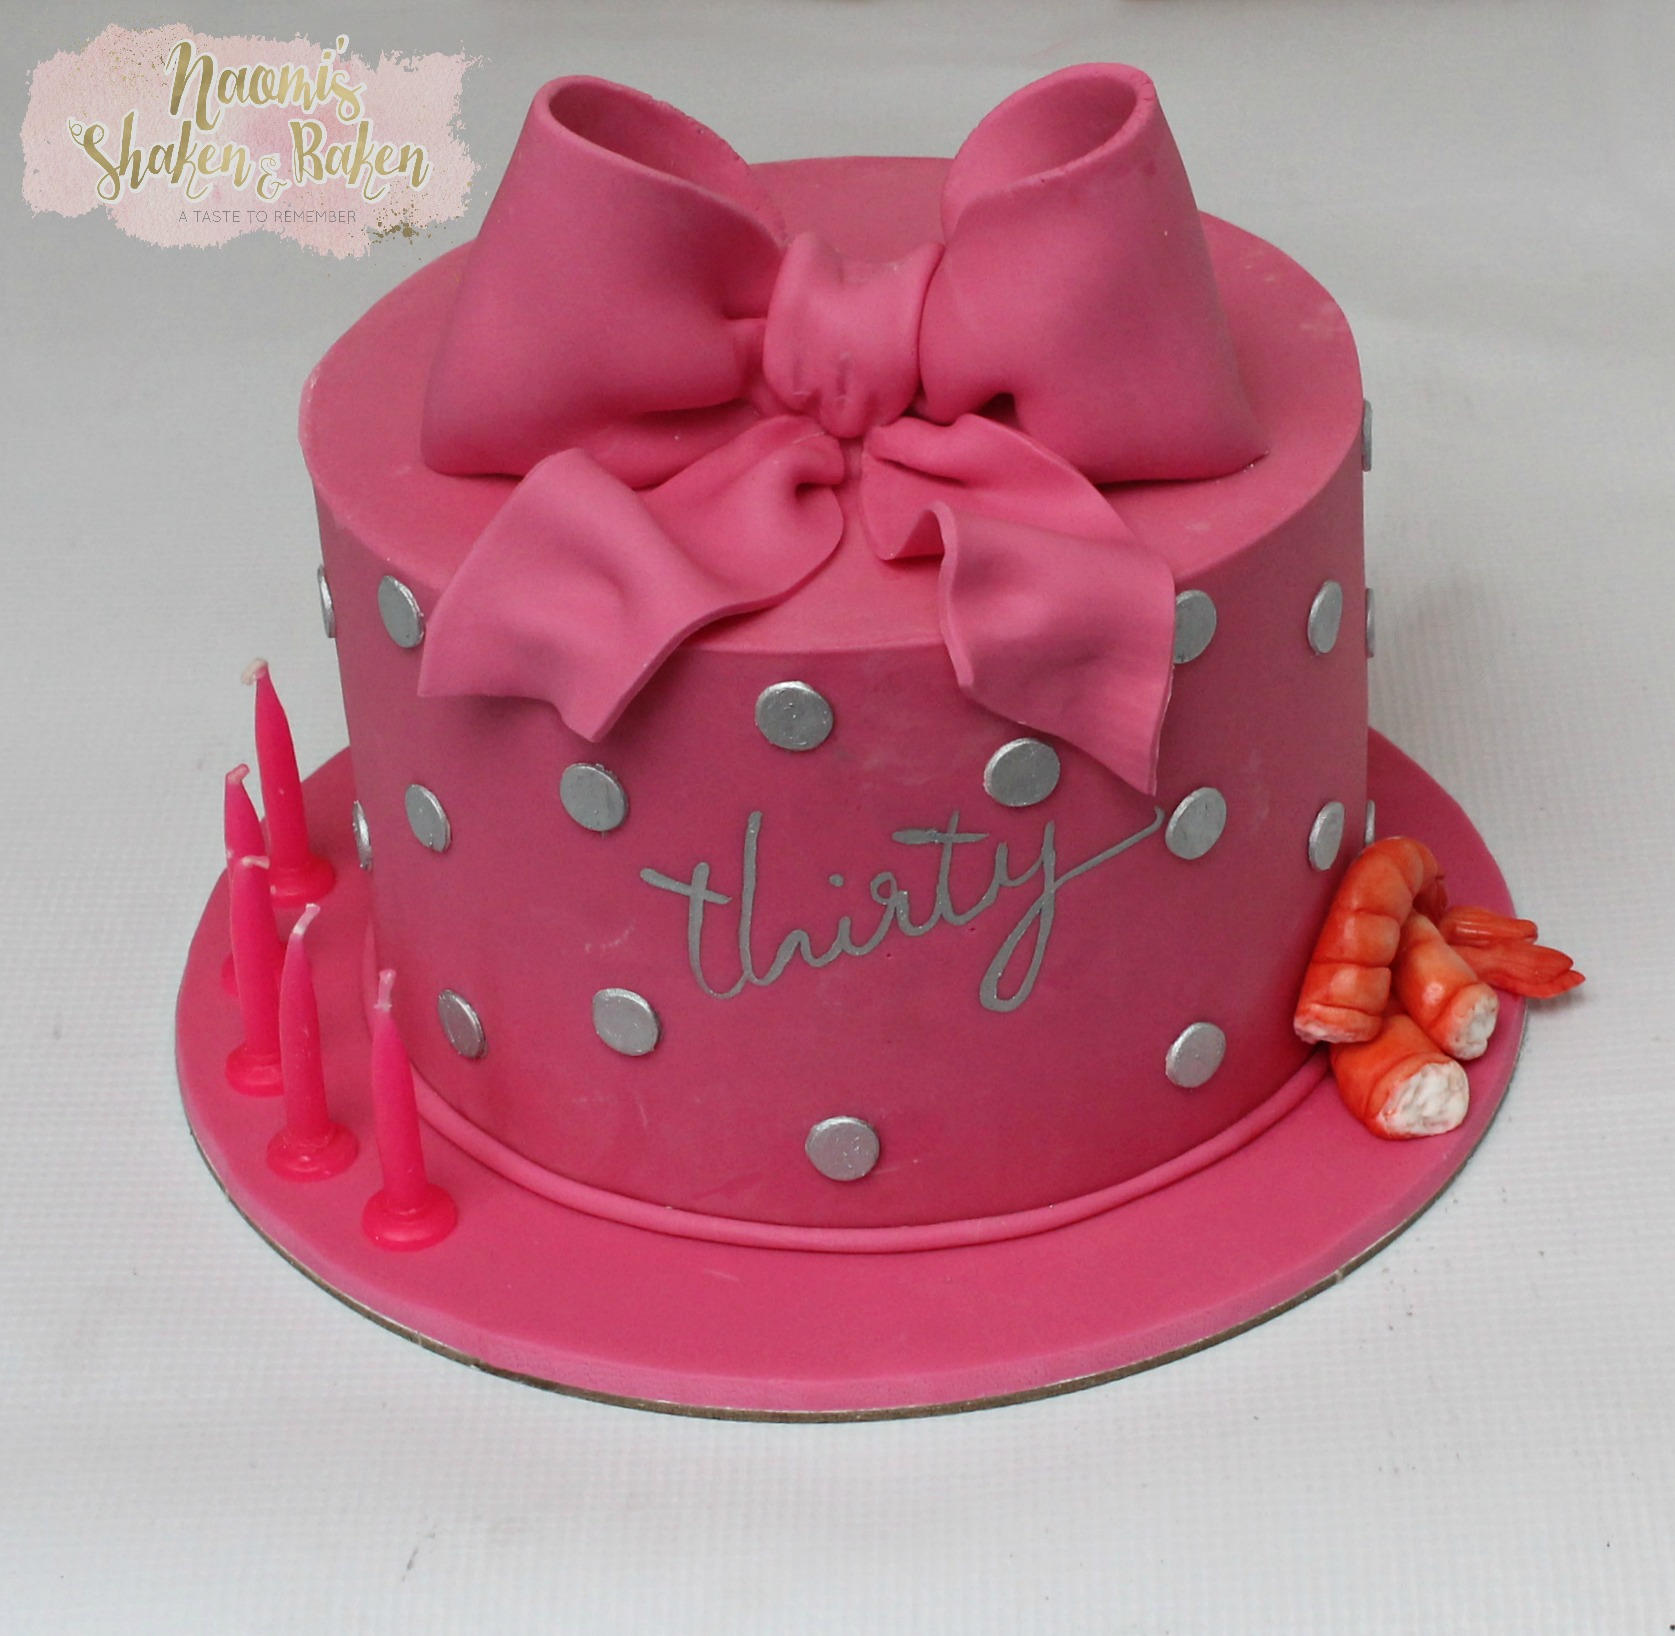 30th birthday cake lover of prawns